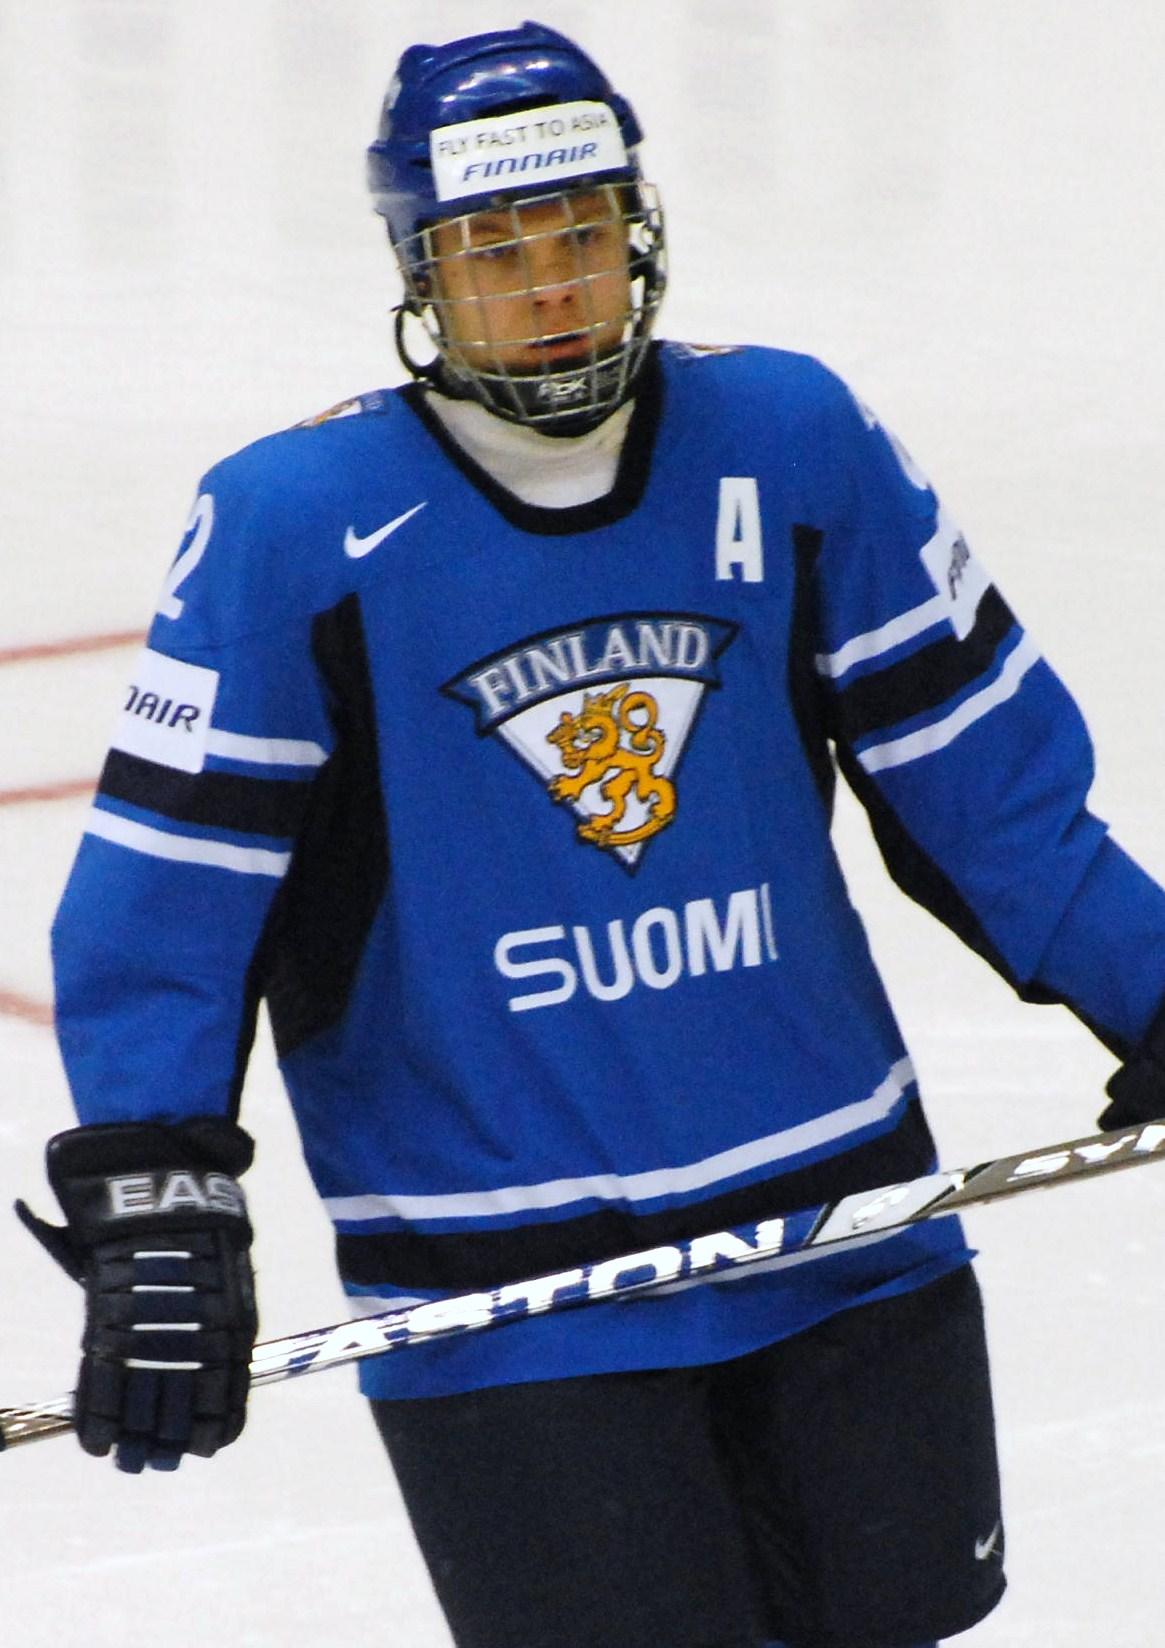 Mikael Granlund Mikael Granlund Wikipedia the free encyclopedia